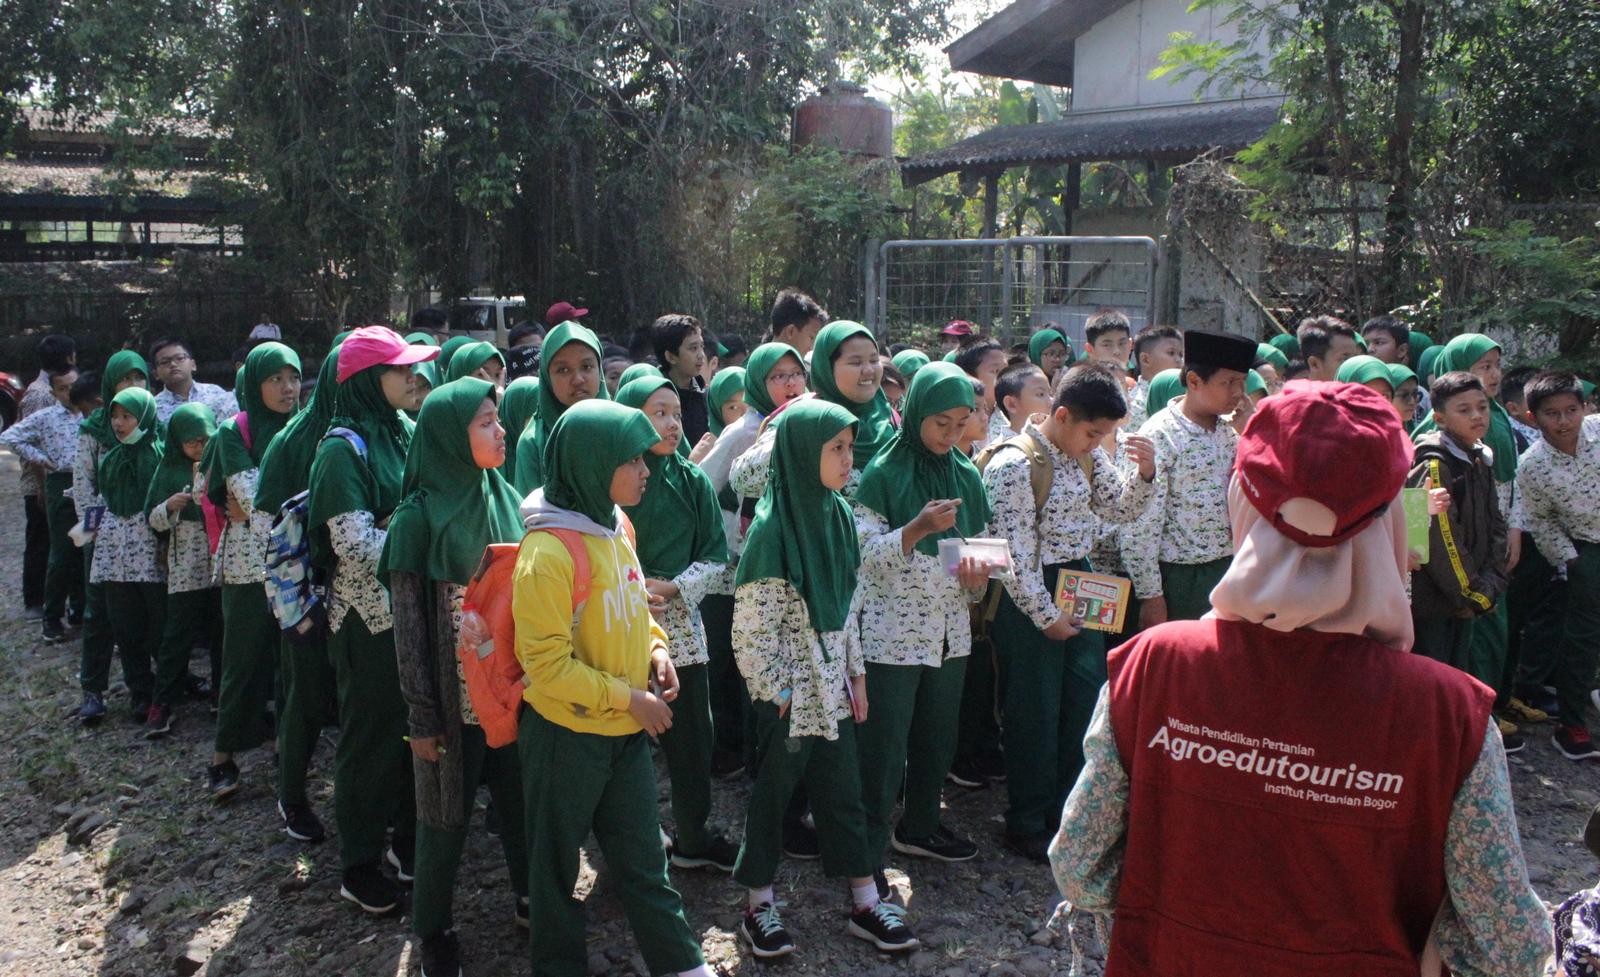 Agroedutourism